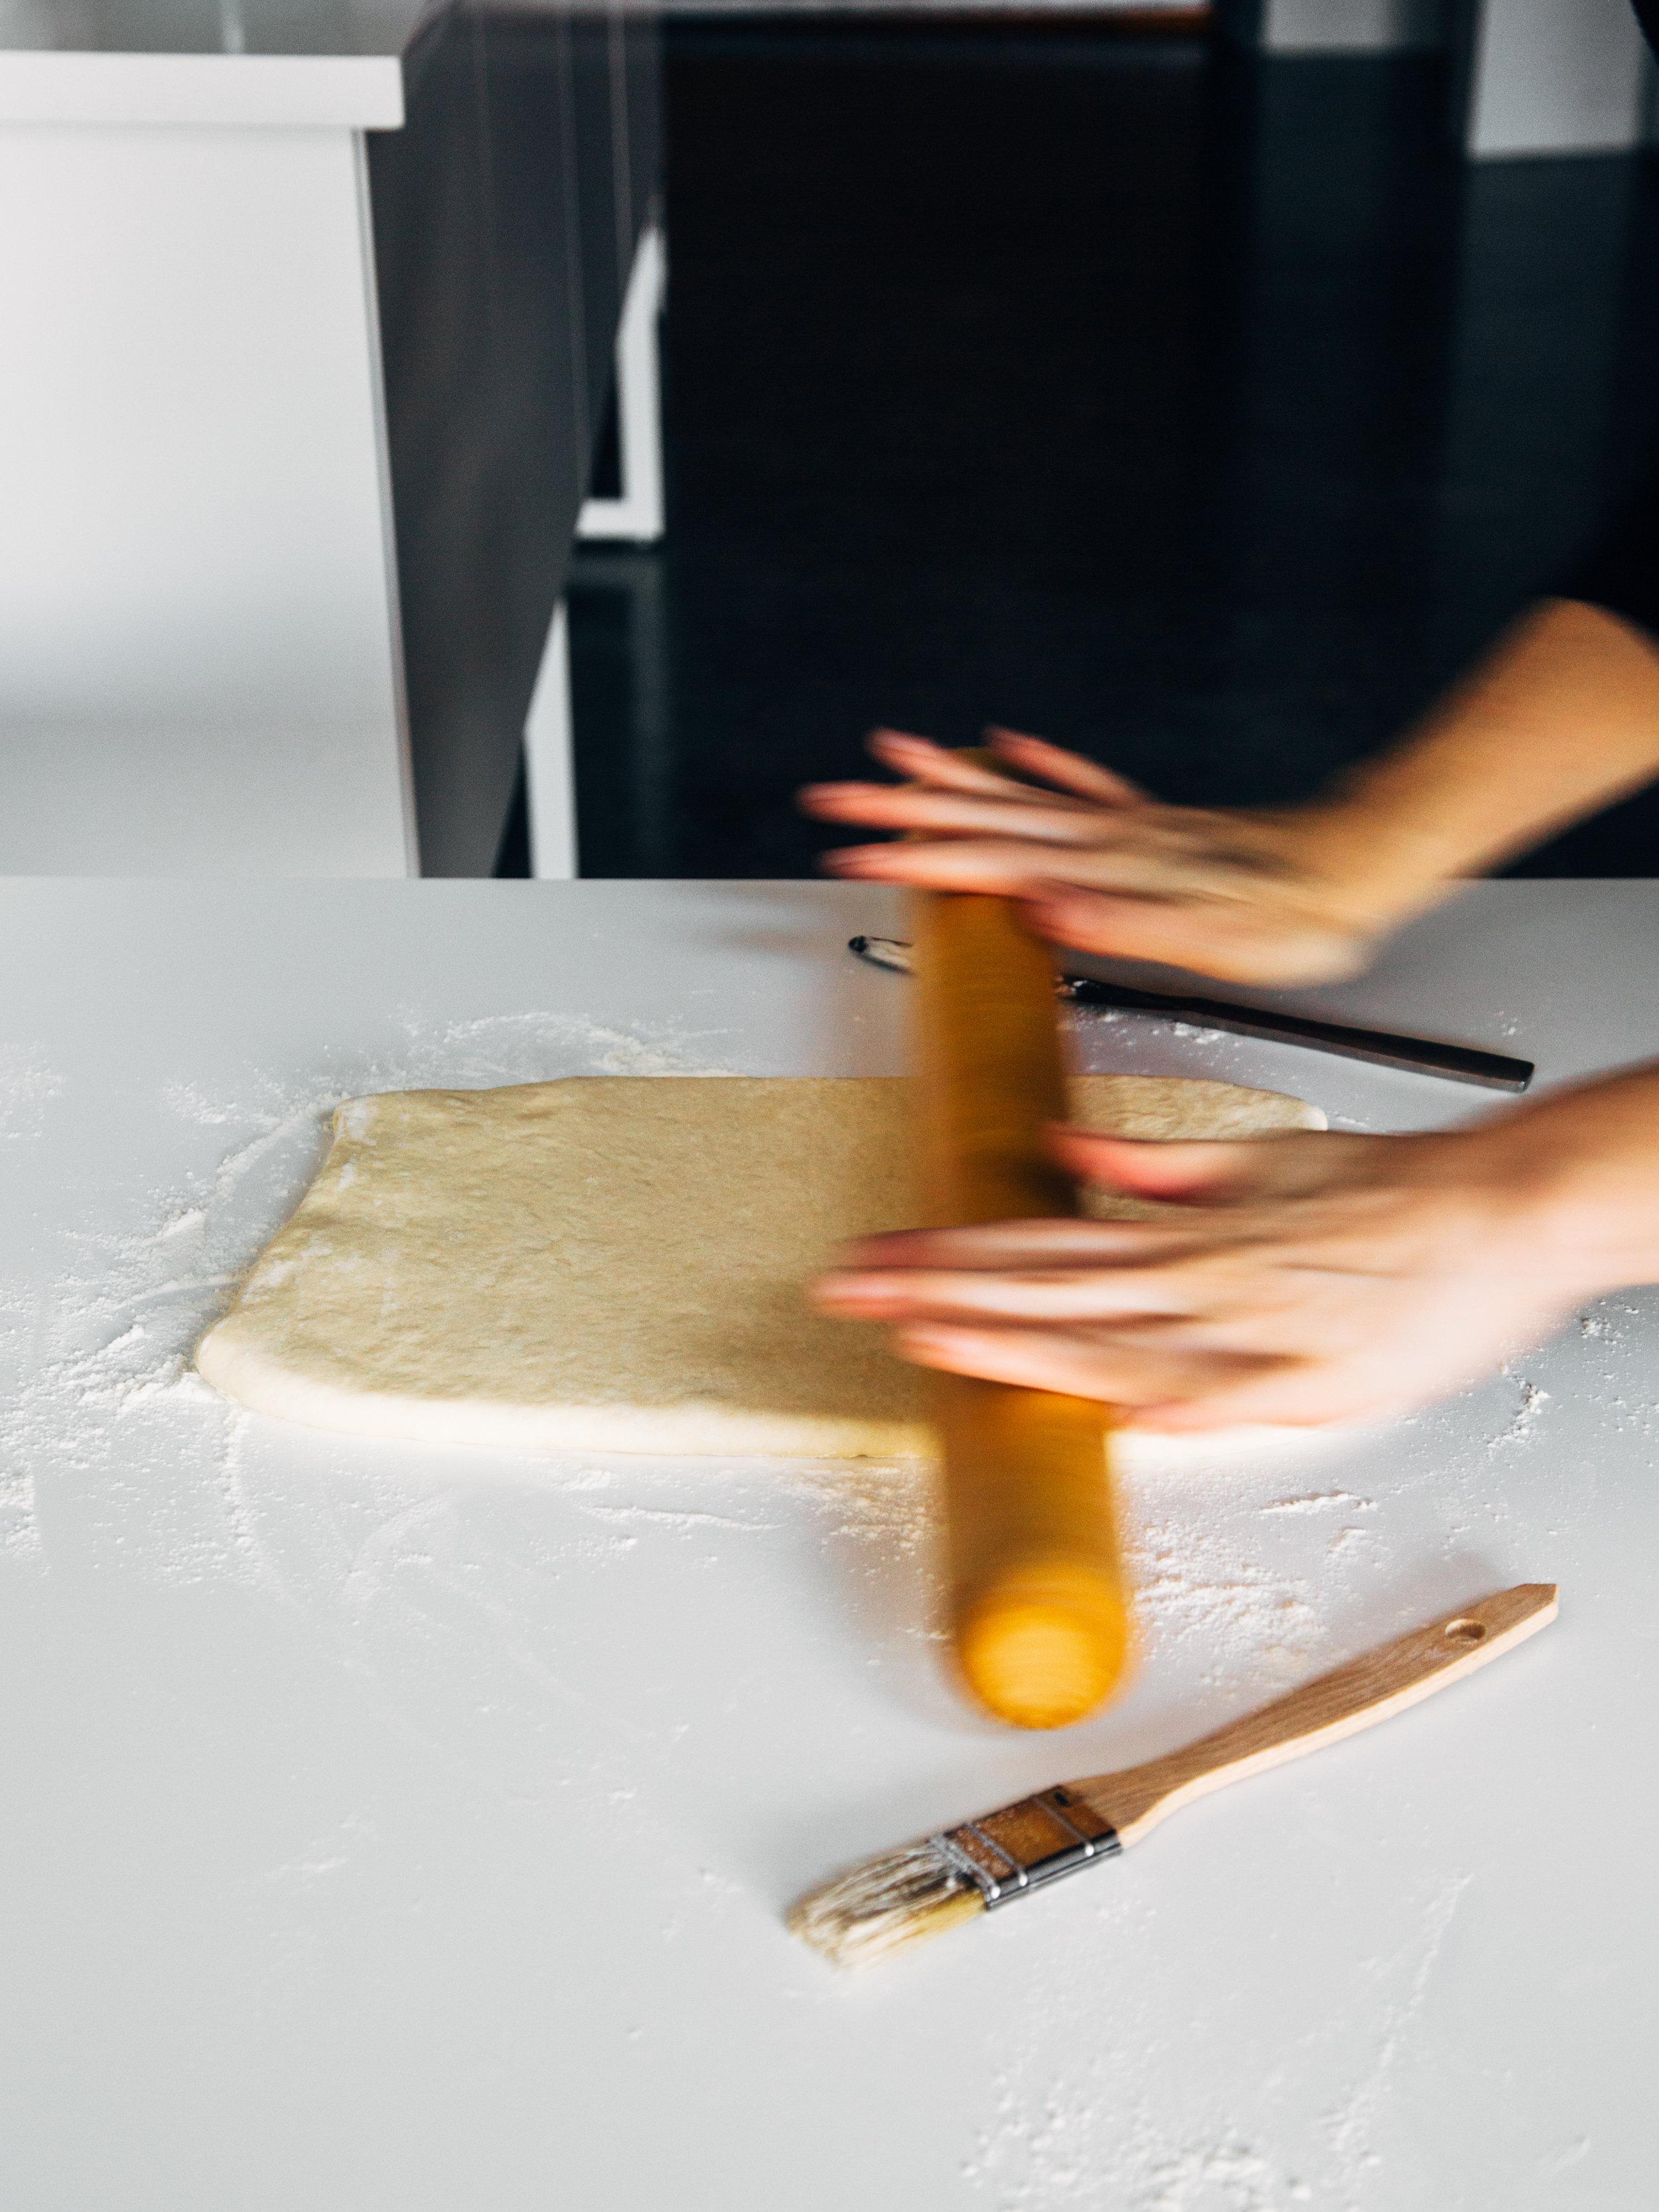 laminated-dough